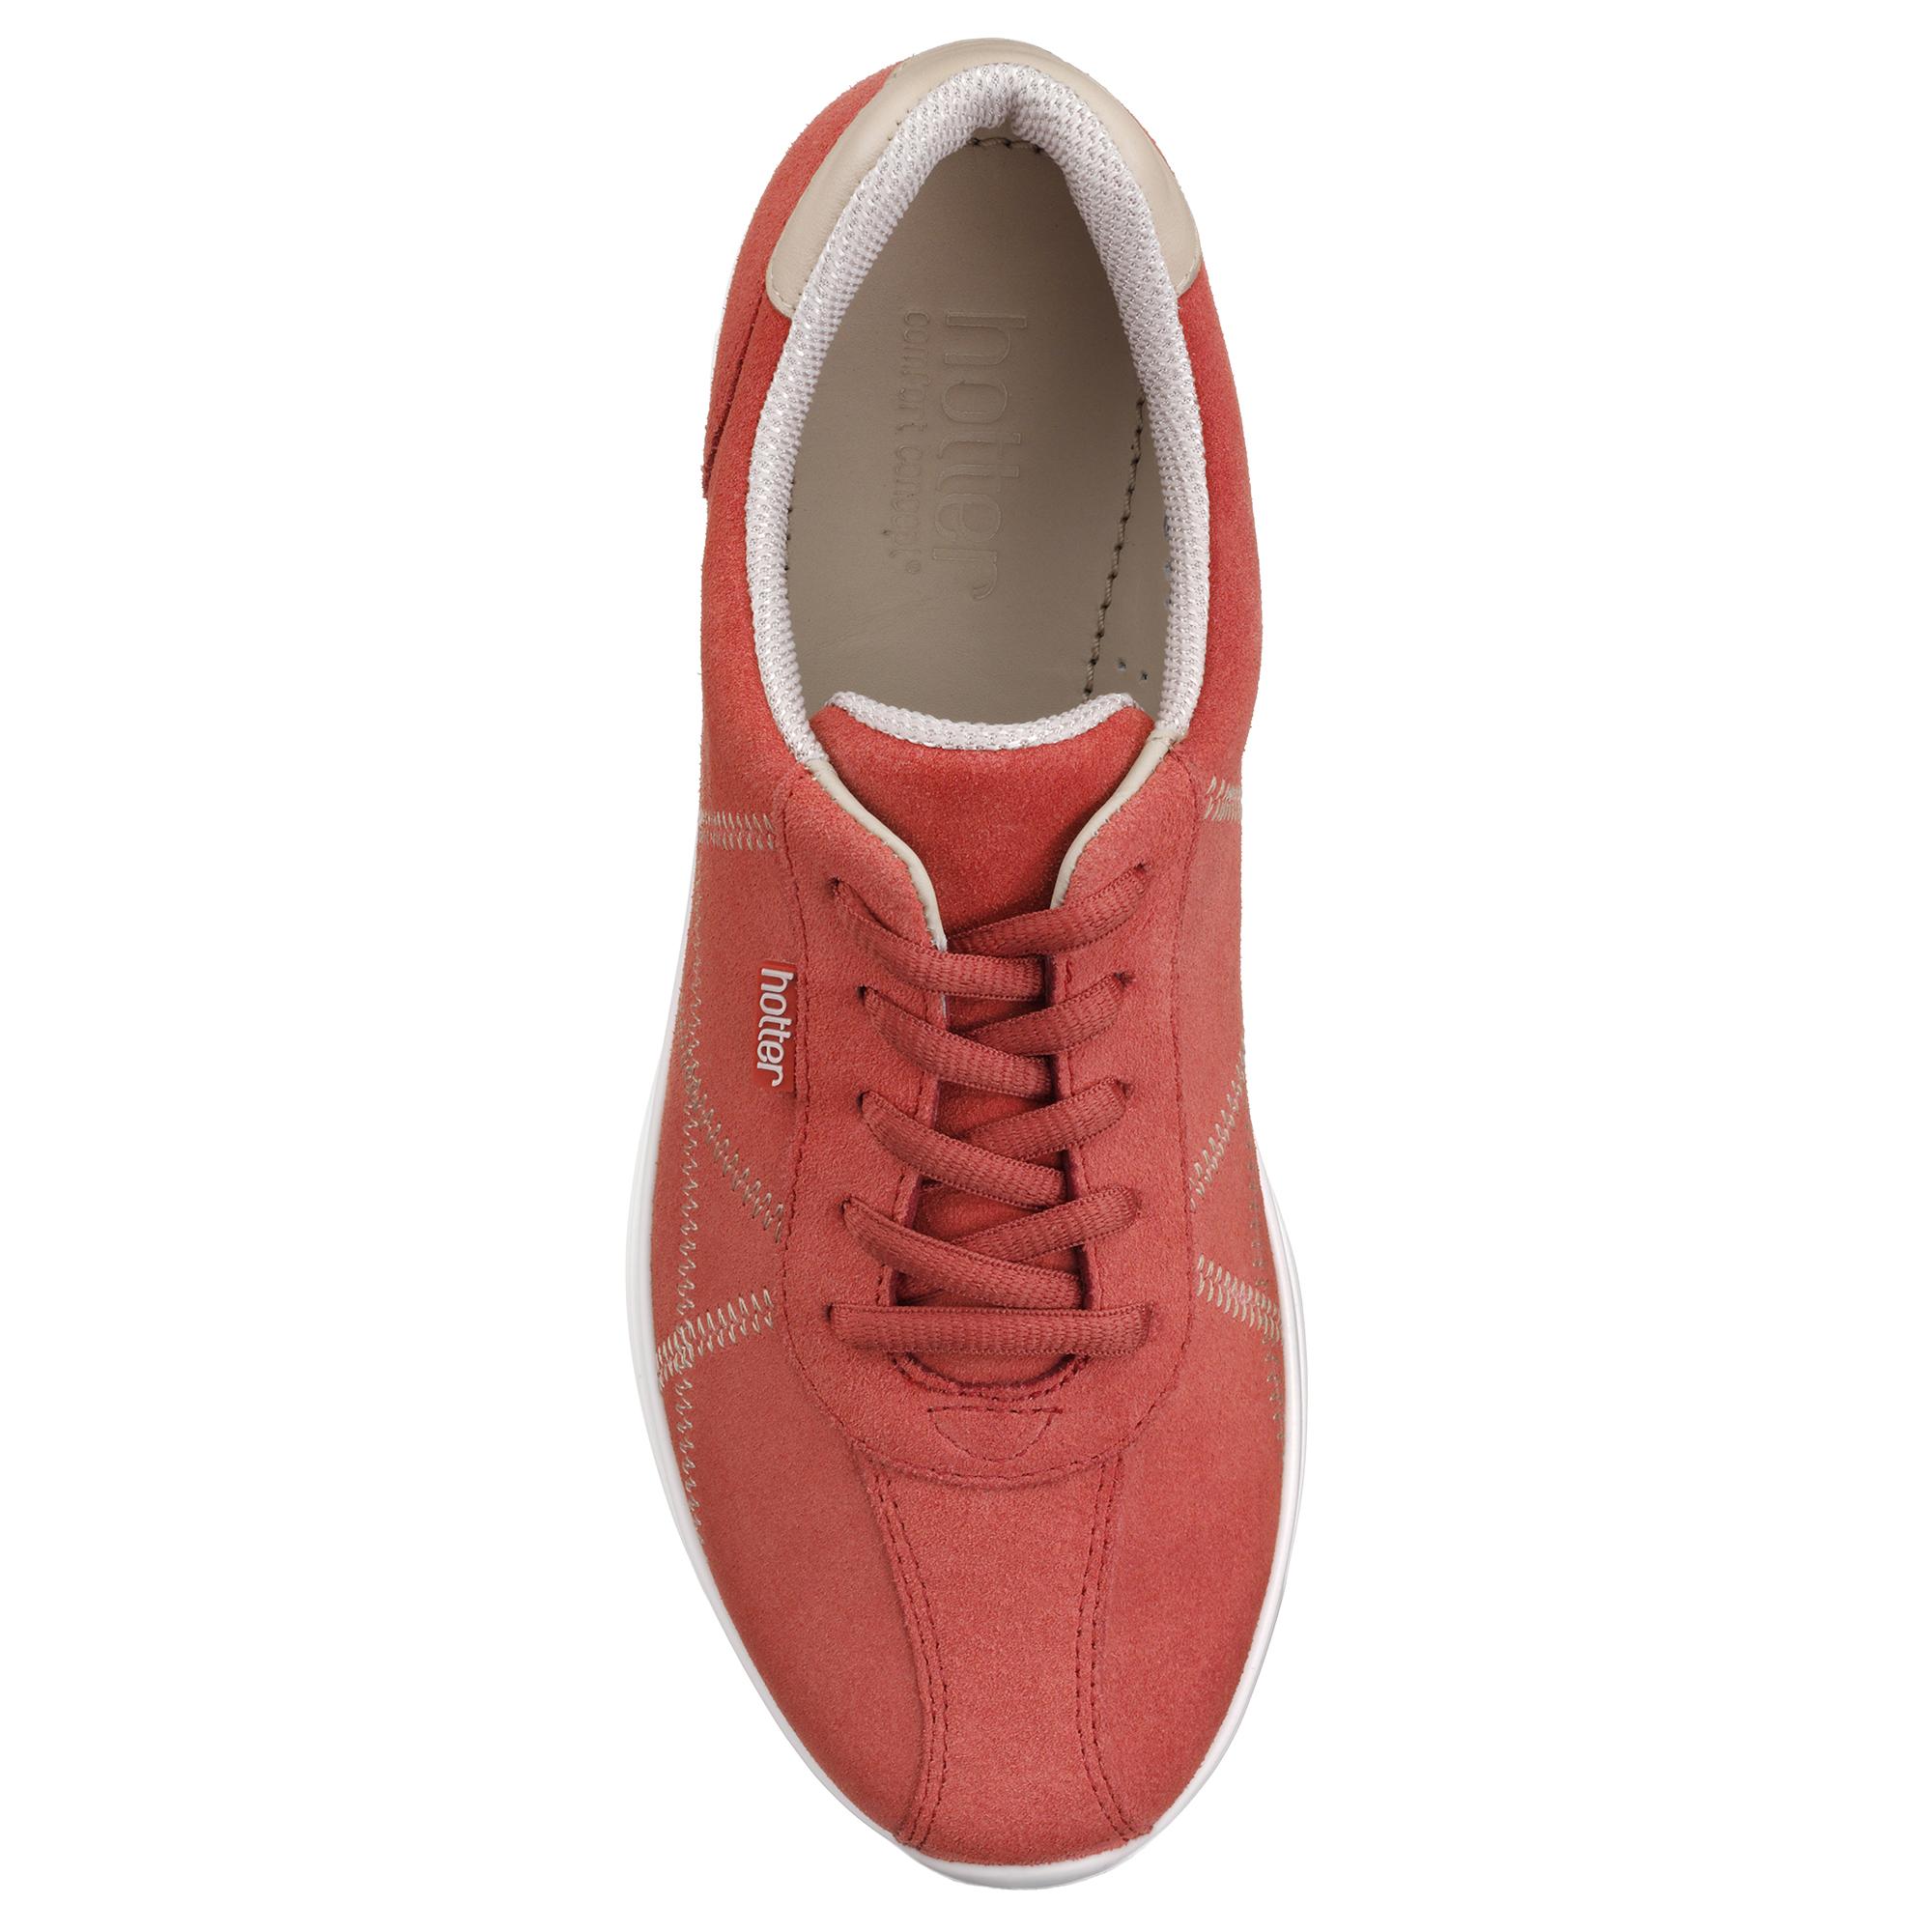 Hotter-Mujer-Solar-Senoras-Activo-Con-Cordones-Zapatos-Calzado-Zapatillas